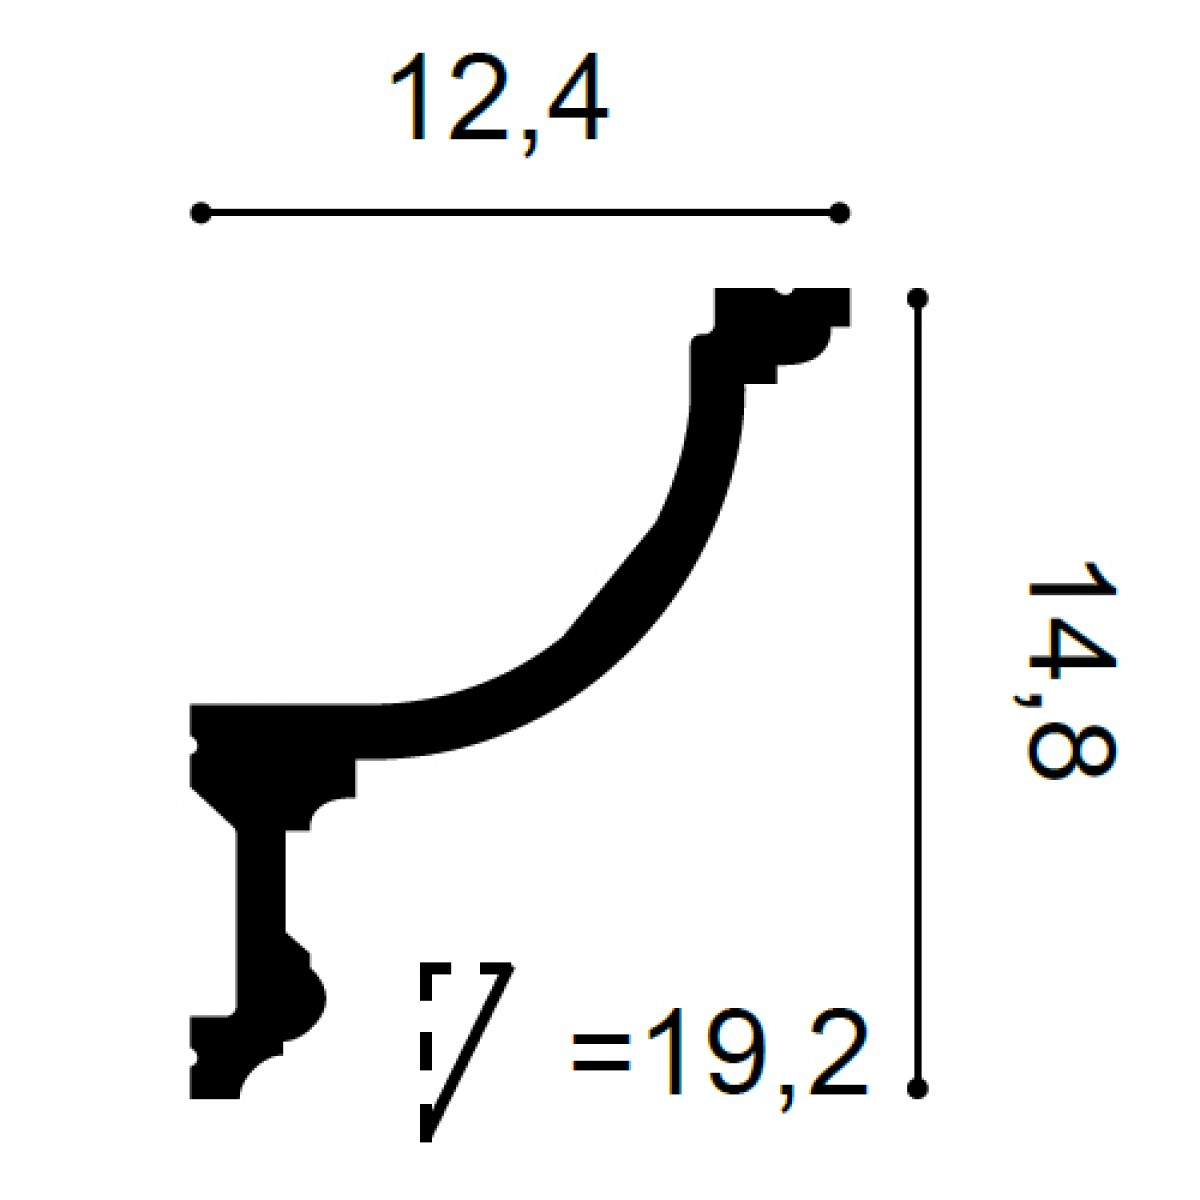 Scafa Luxxus C901, Dimensiuni: 200 X 15.2 X 12.4 cm, Orac Decor